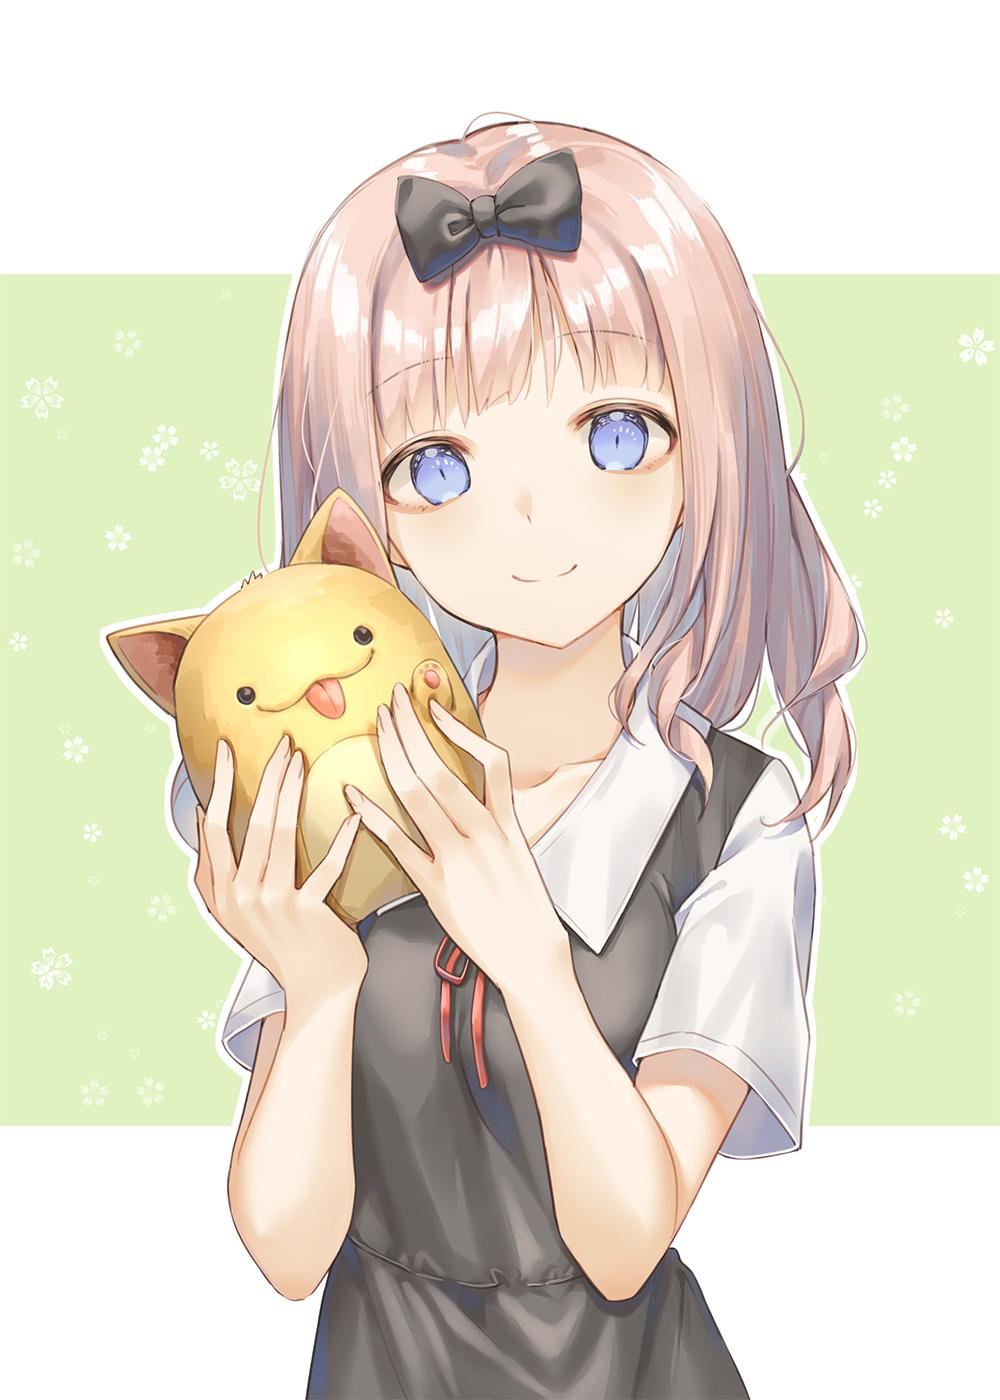 Anime 1000x1400 anime anime girls digital art artwork 2D portrait display vertical Kaguya-Sama: Love is War Chika Fujiwara Cha Chya school uniform